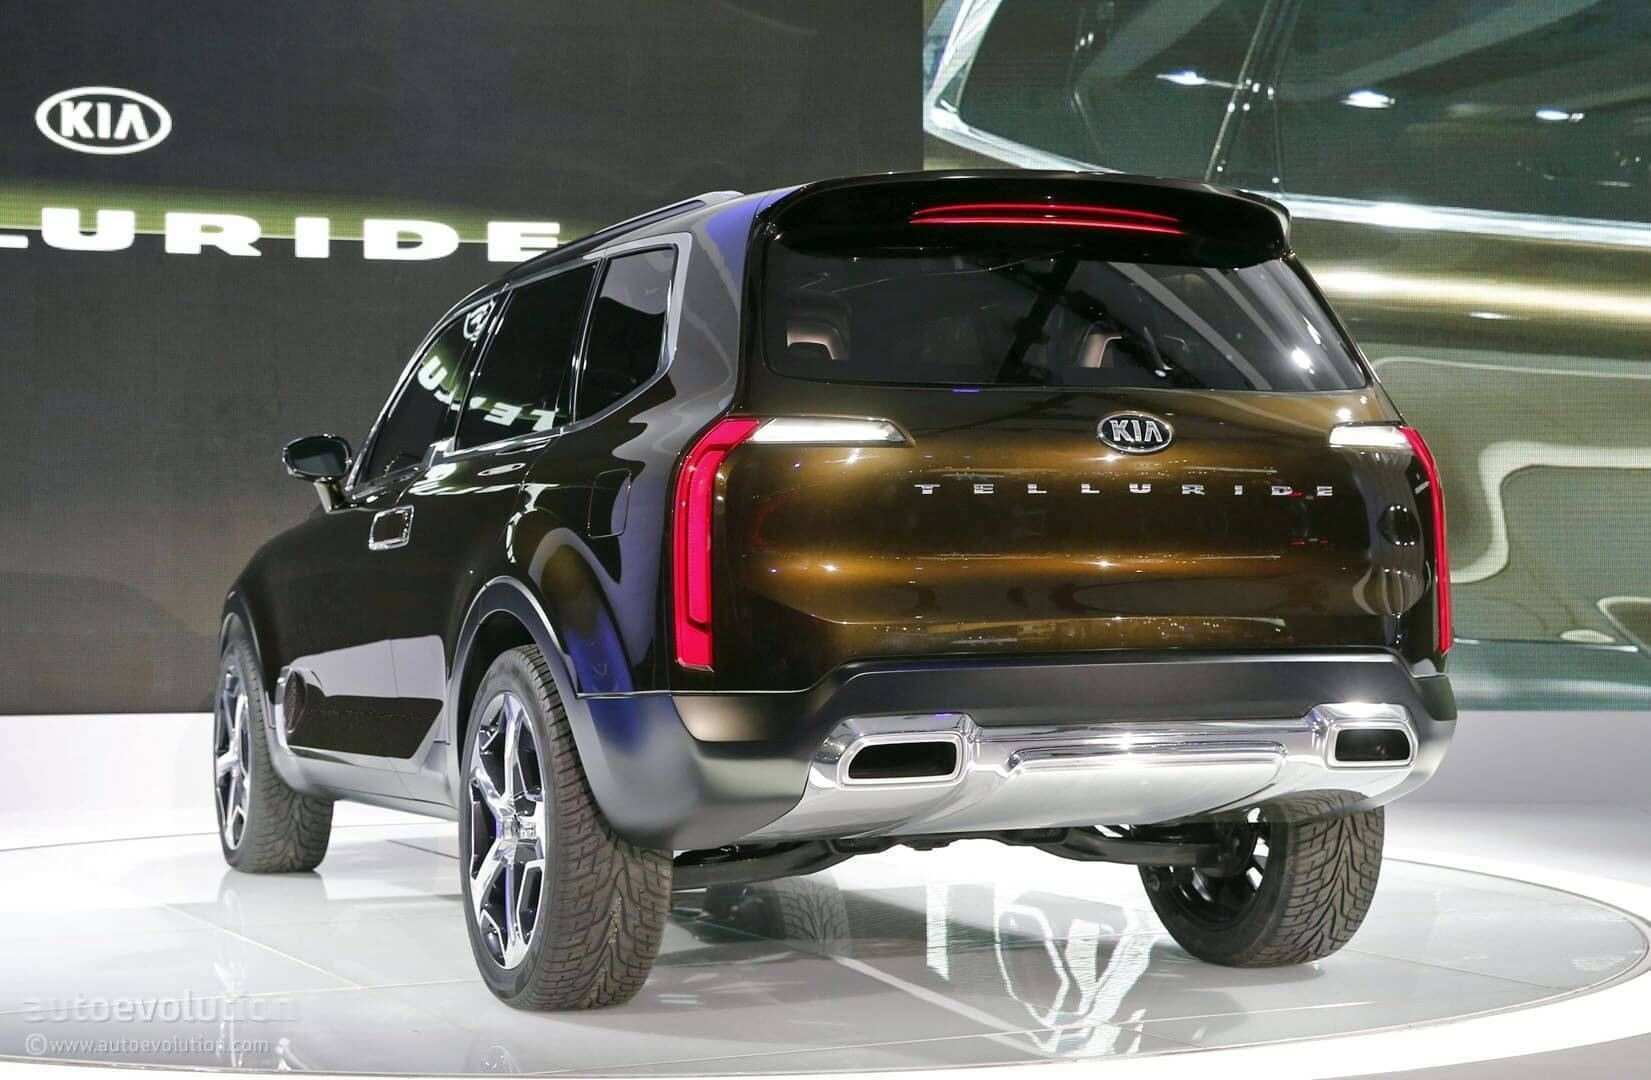 55 Concept of Kia 2020 Cars Rumors for Kia 2020 Cars